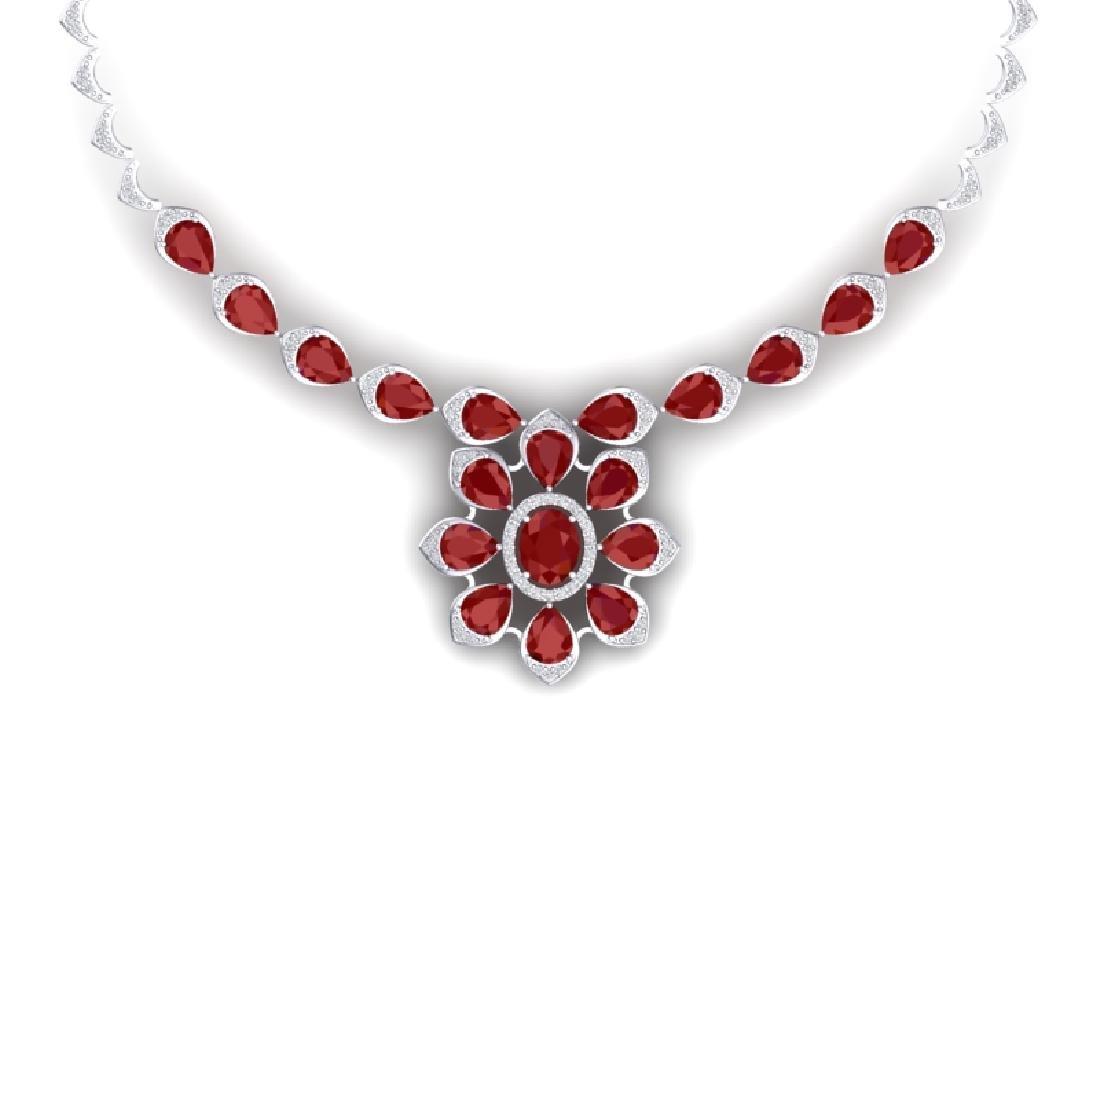 30.70 CTW Royalty Ruby & VS Diamond Necklace 18K White